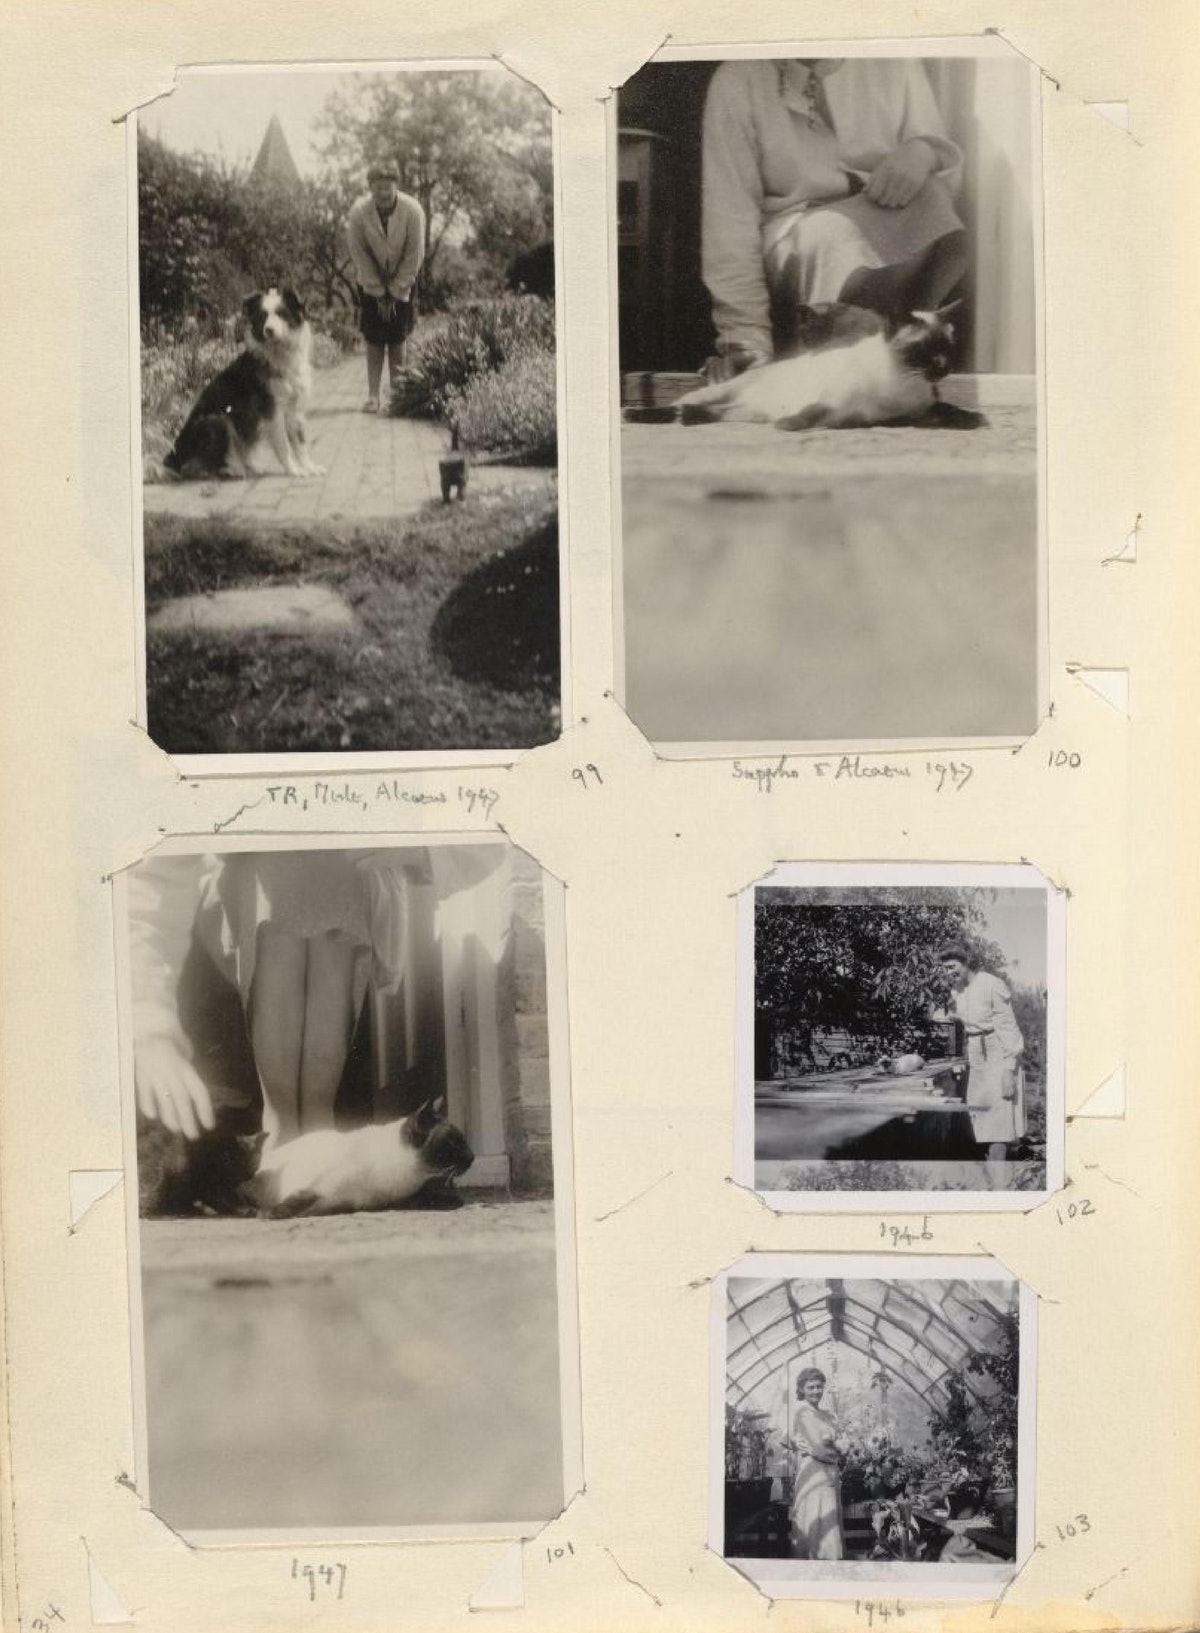 virginia-wolf-15-page-001.jpg